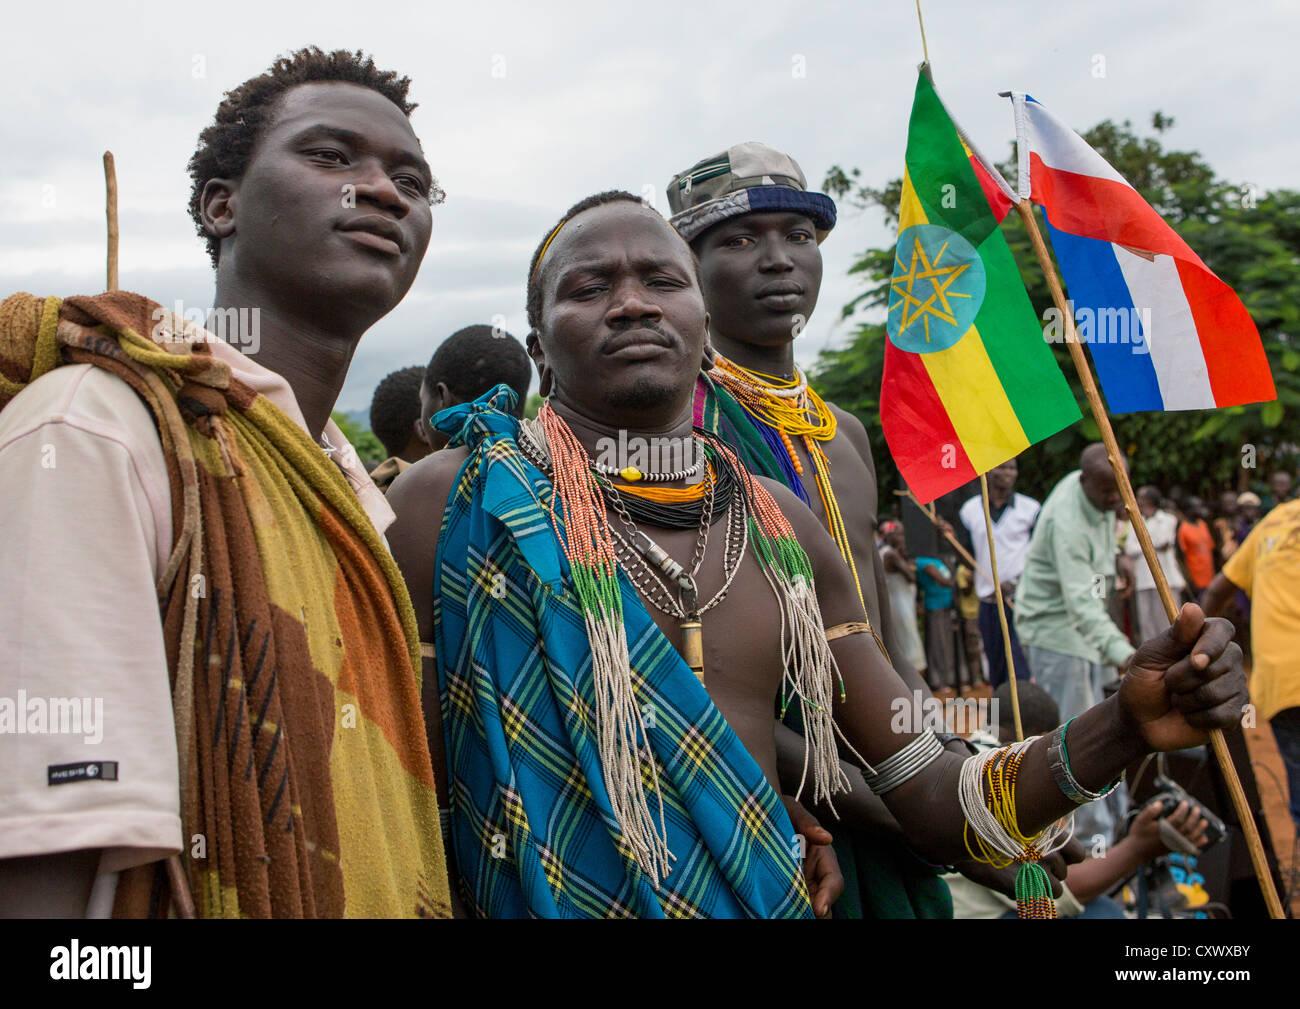 Suri Tribe Men At A Ceremony Organized By The Government, Kibish, Omo Valley, Ethiopia Stock Photo